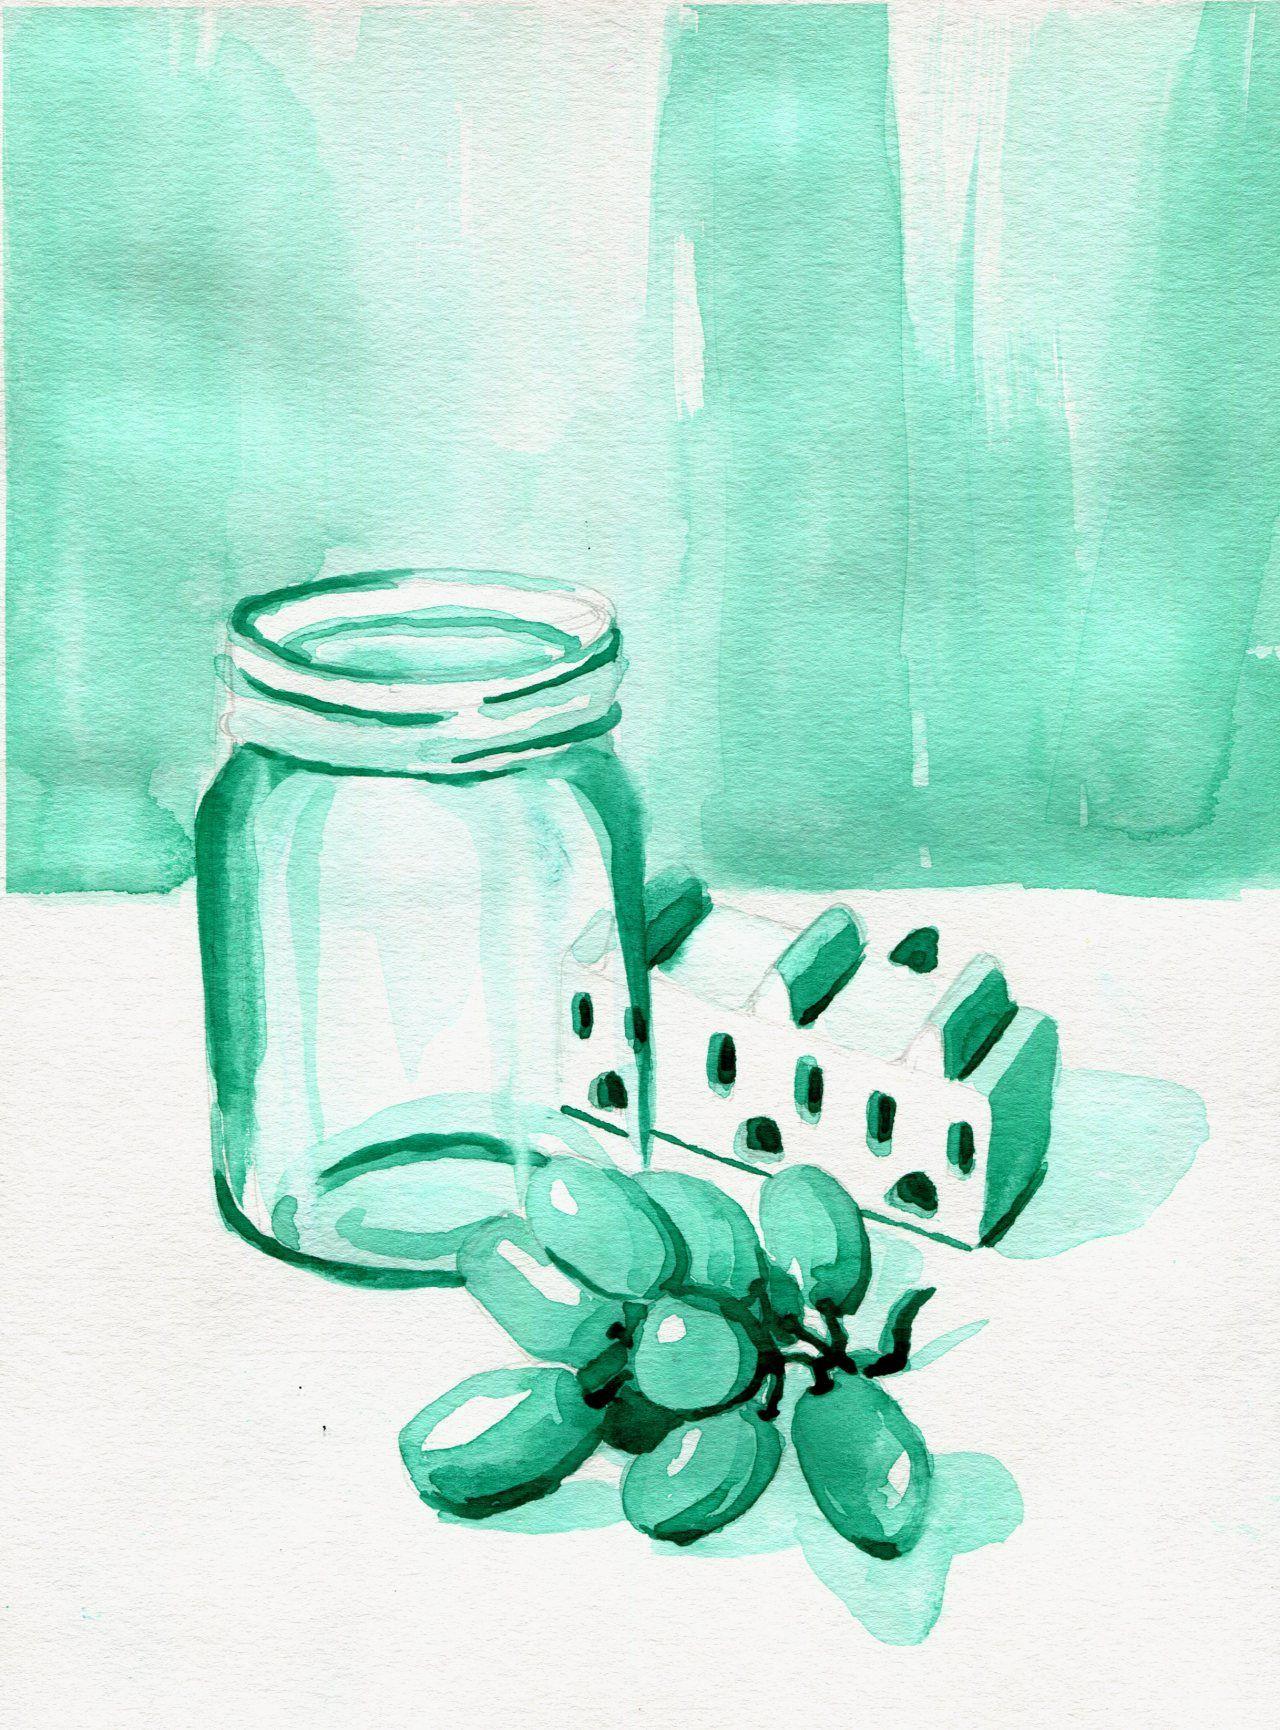 Vistoso Esmalte De Uñas Crujido Ornamento - Ideas Para Pintar Uñas ...